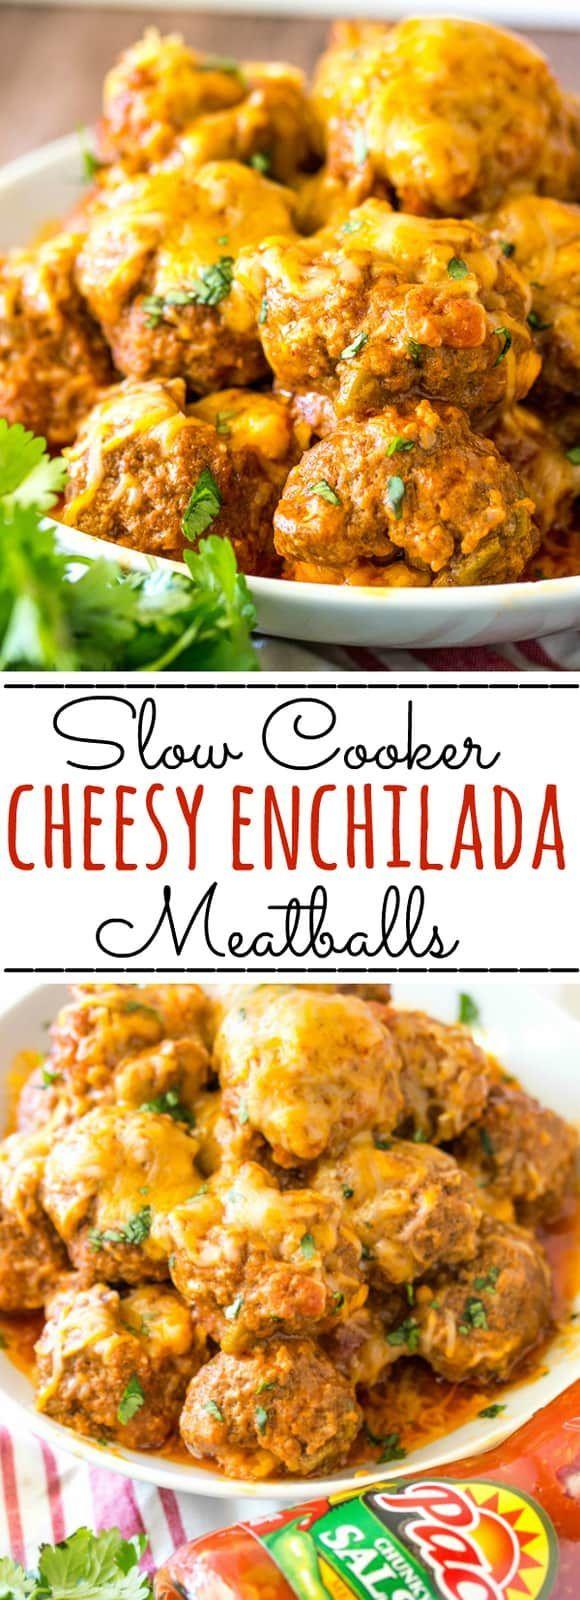 Cheesy Enchilada Crockpot Meatballs